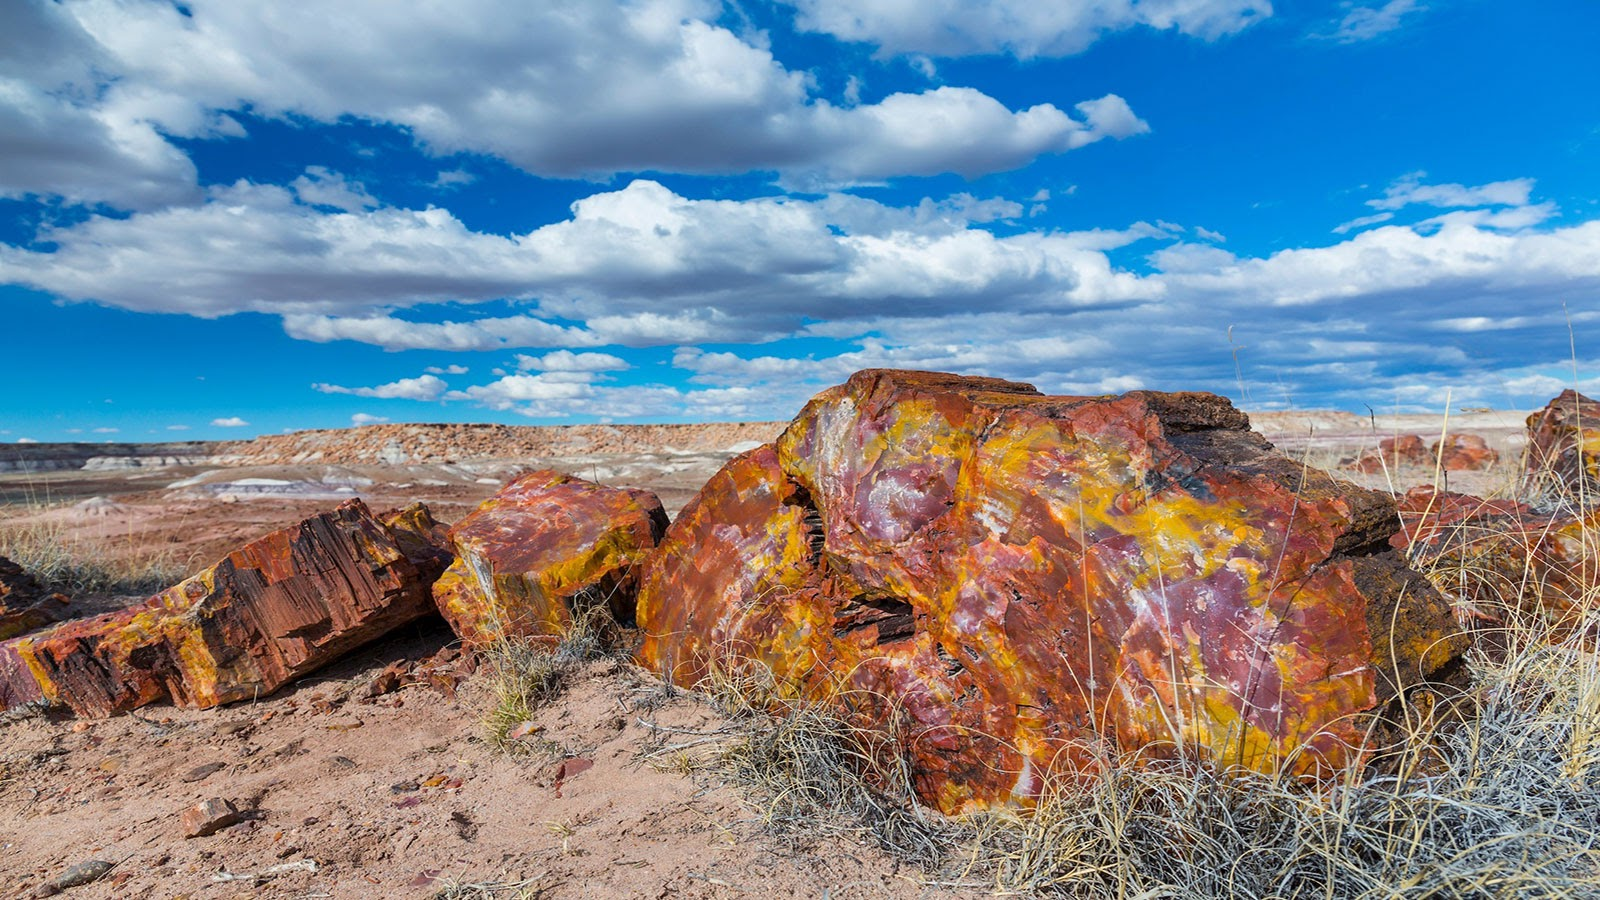 石化林国家公园 Petrified Forest National Park, AZ